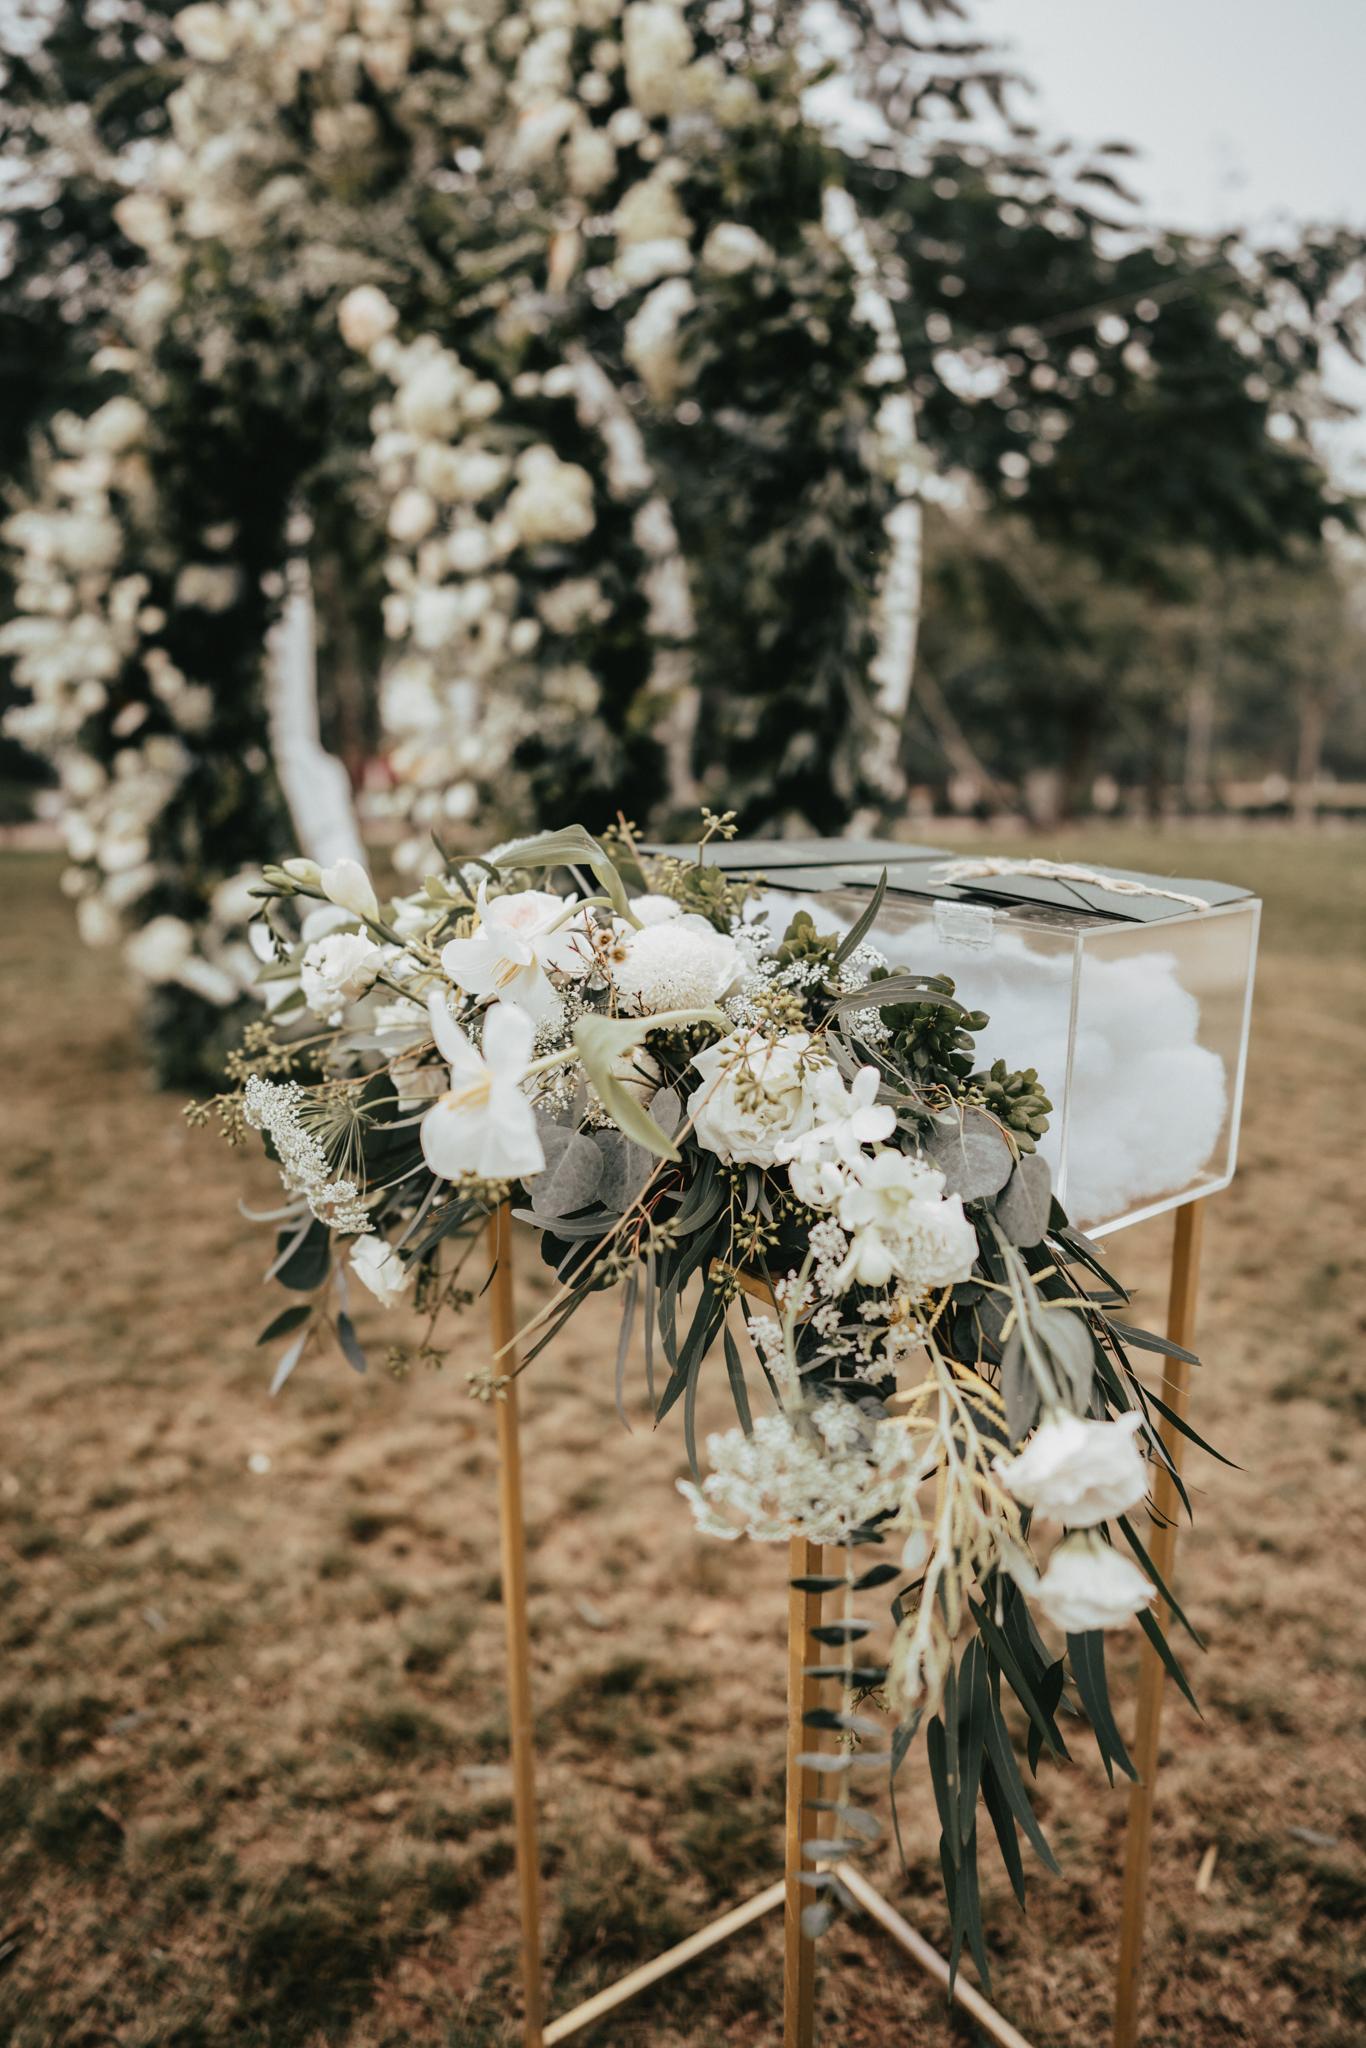 JWMarriott Ha Noi Intimate Wedding of Trang Hi well captured by Hipster Wedding Vietnam Wedding Photographer-35801.jpg